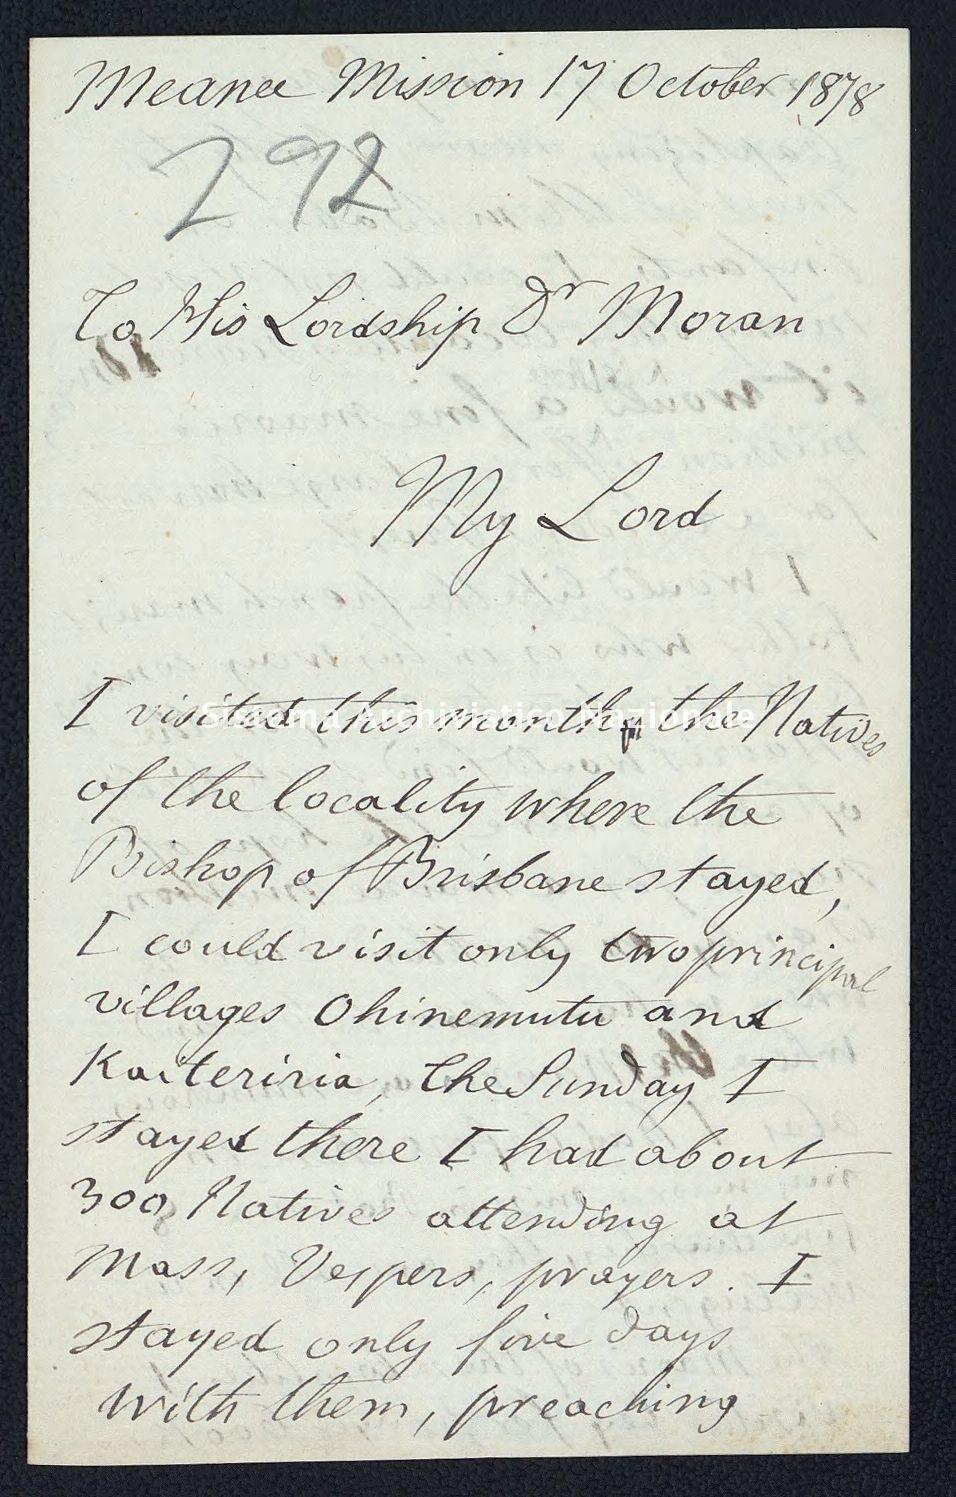 Pontificio Collegio Irlandese - Kirby_1878_292